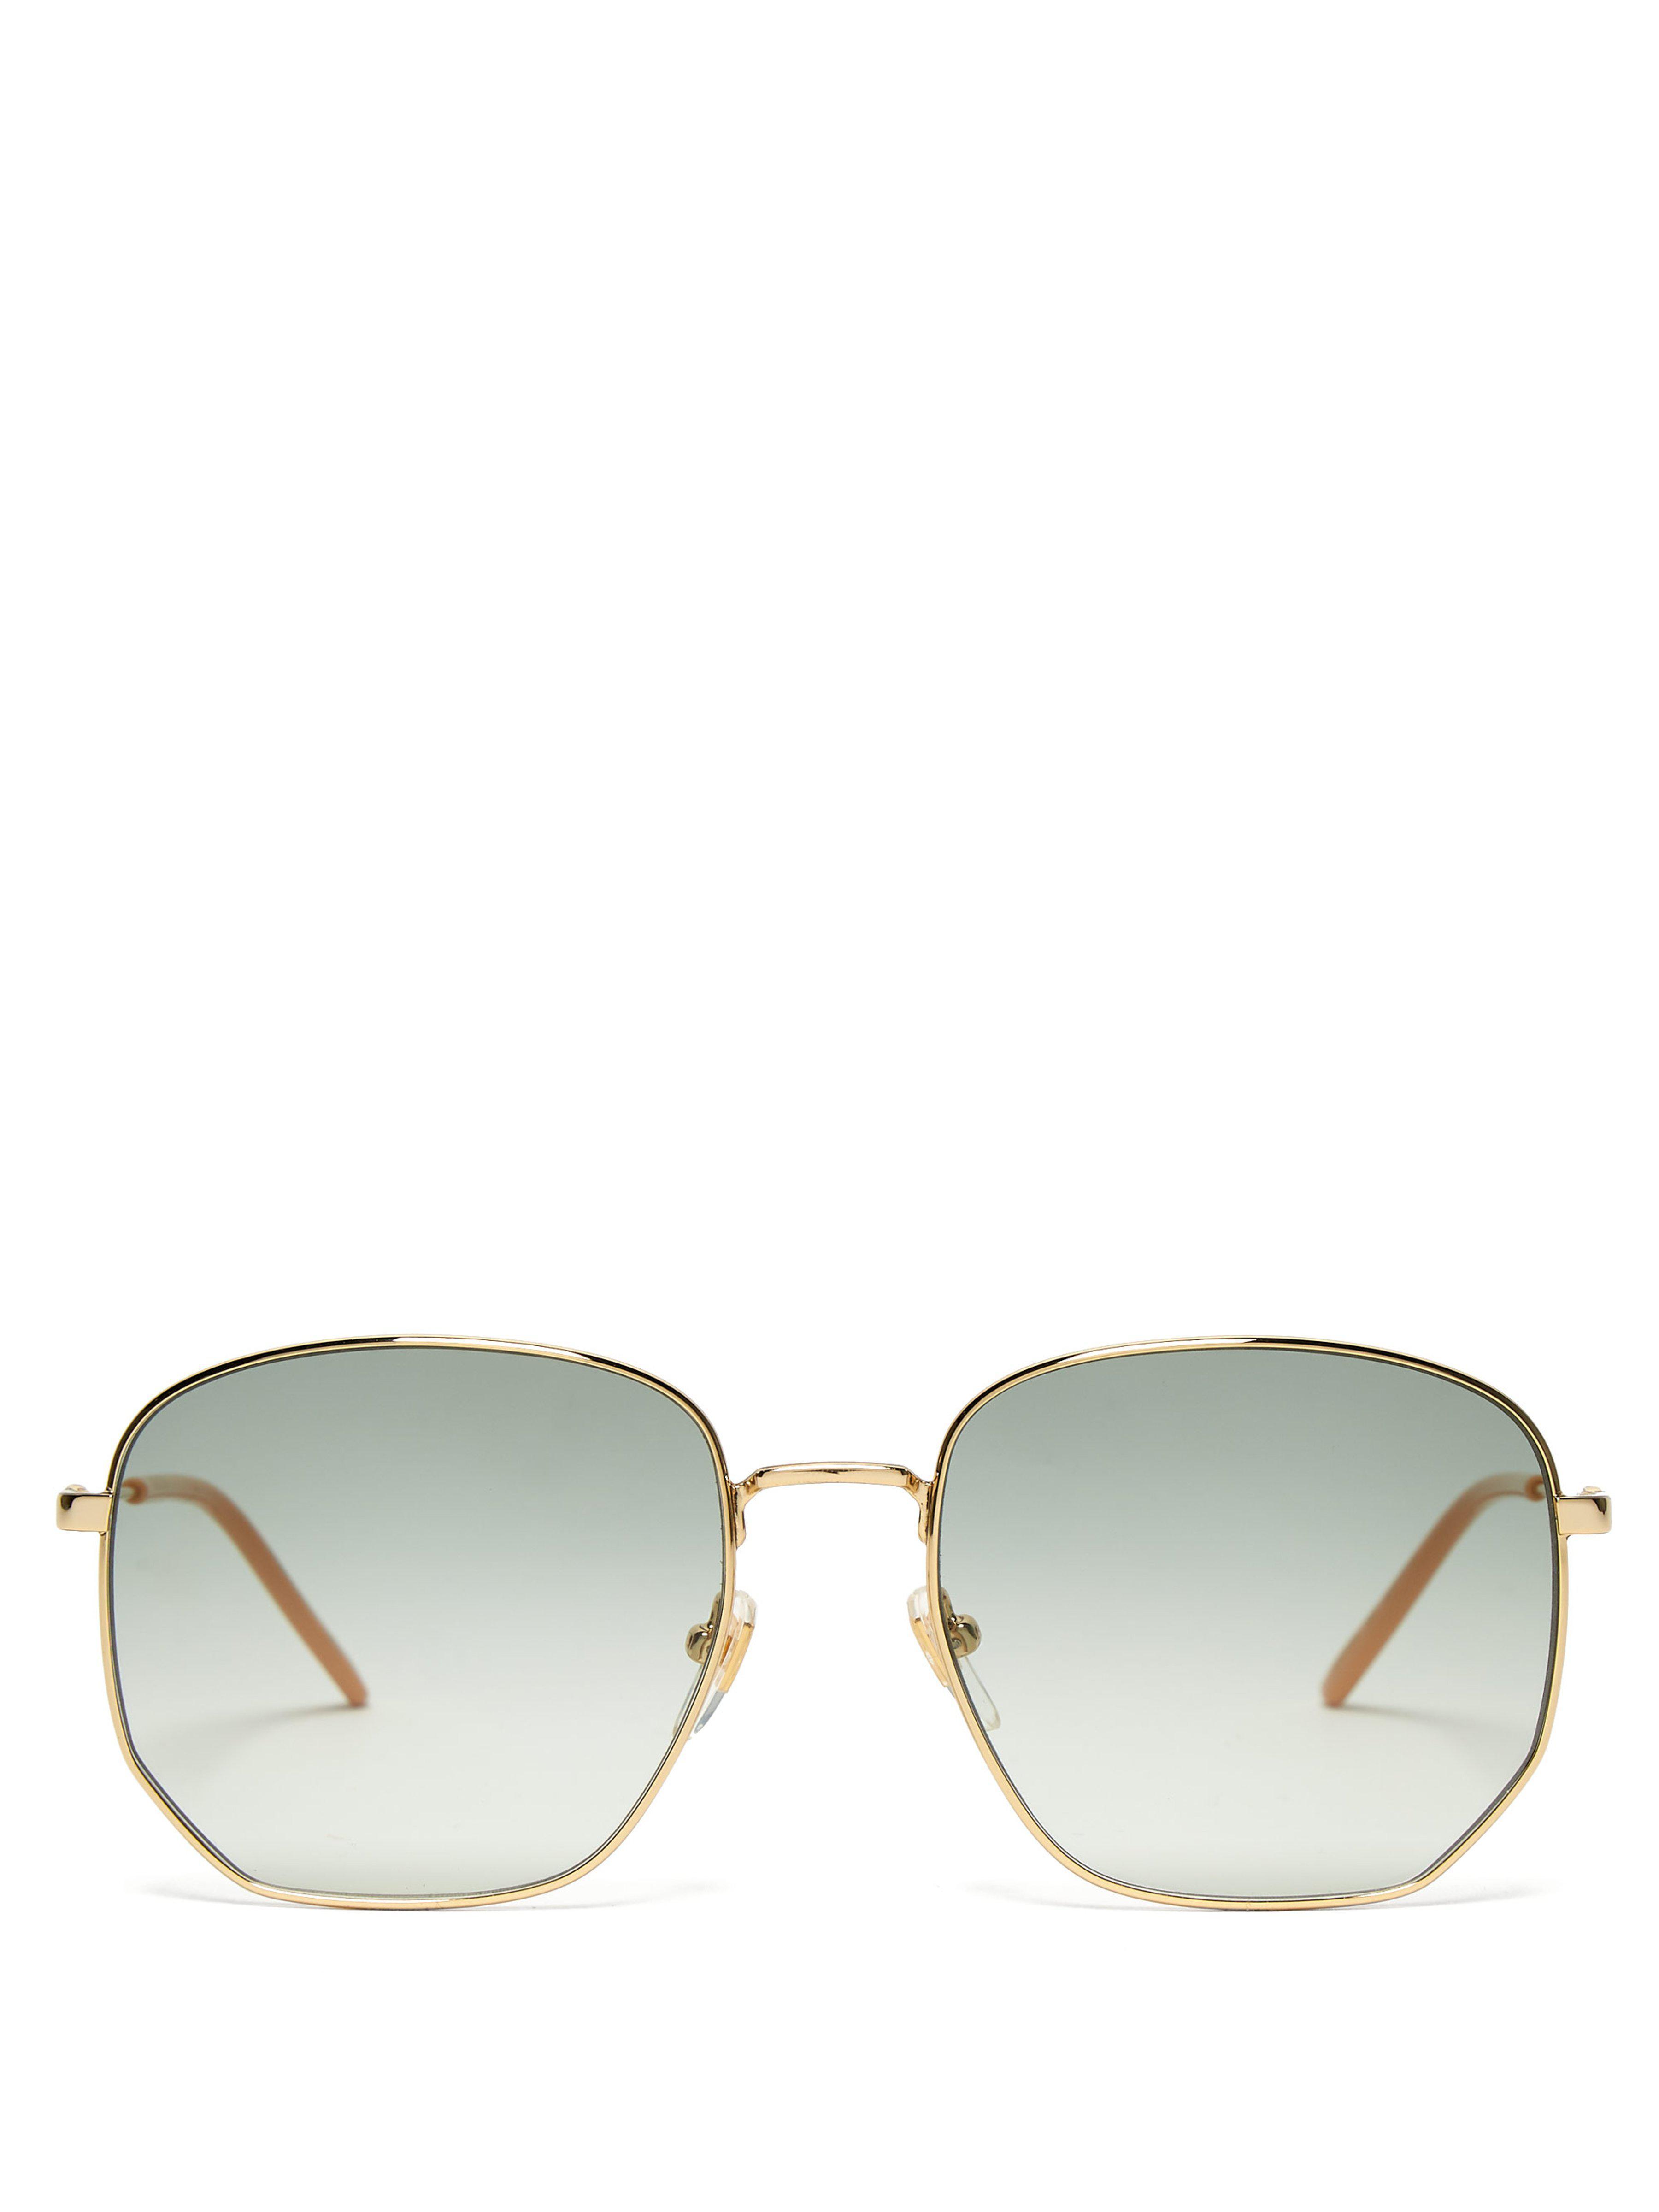 7769cc7ee1 Gucci Gg Metal Frame Sunglasses - Lyst